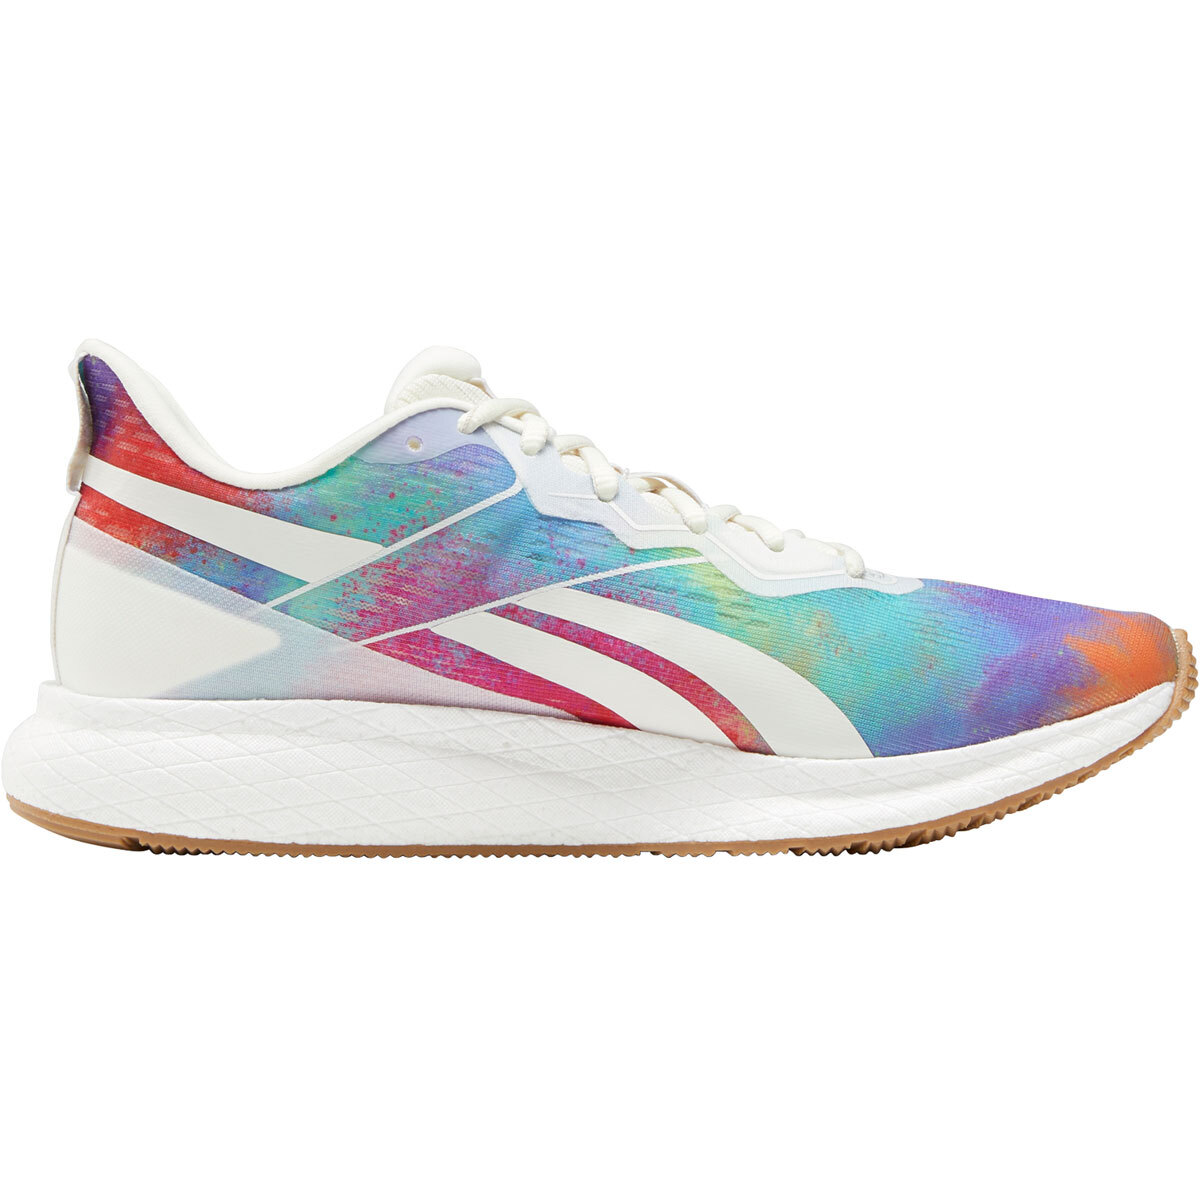 Women's Reebok Forever Floatride Energy 2.0 Running Shoe - Color: Pride - Size: 5 - Width: Regular, Pride, large, image 3